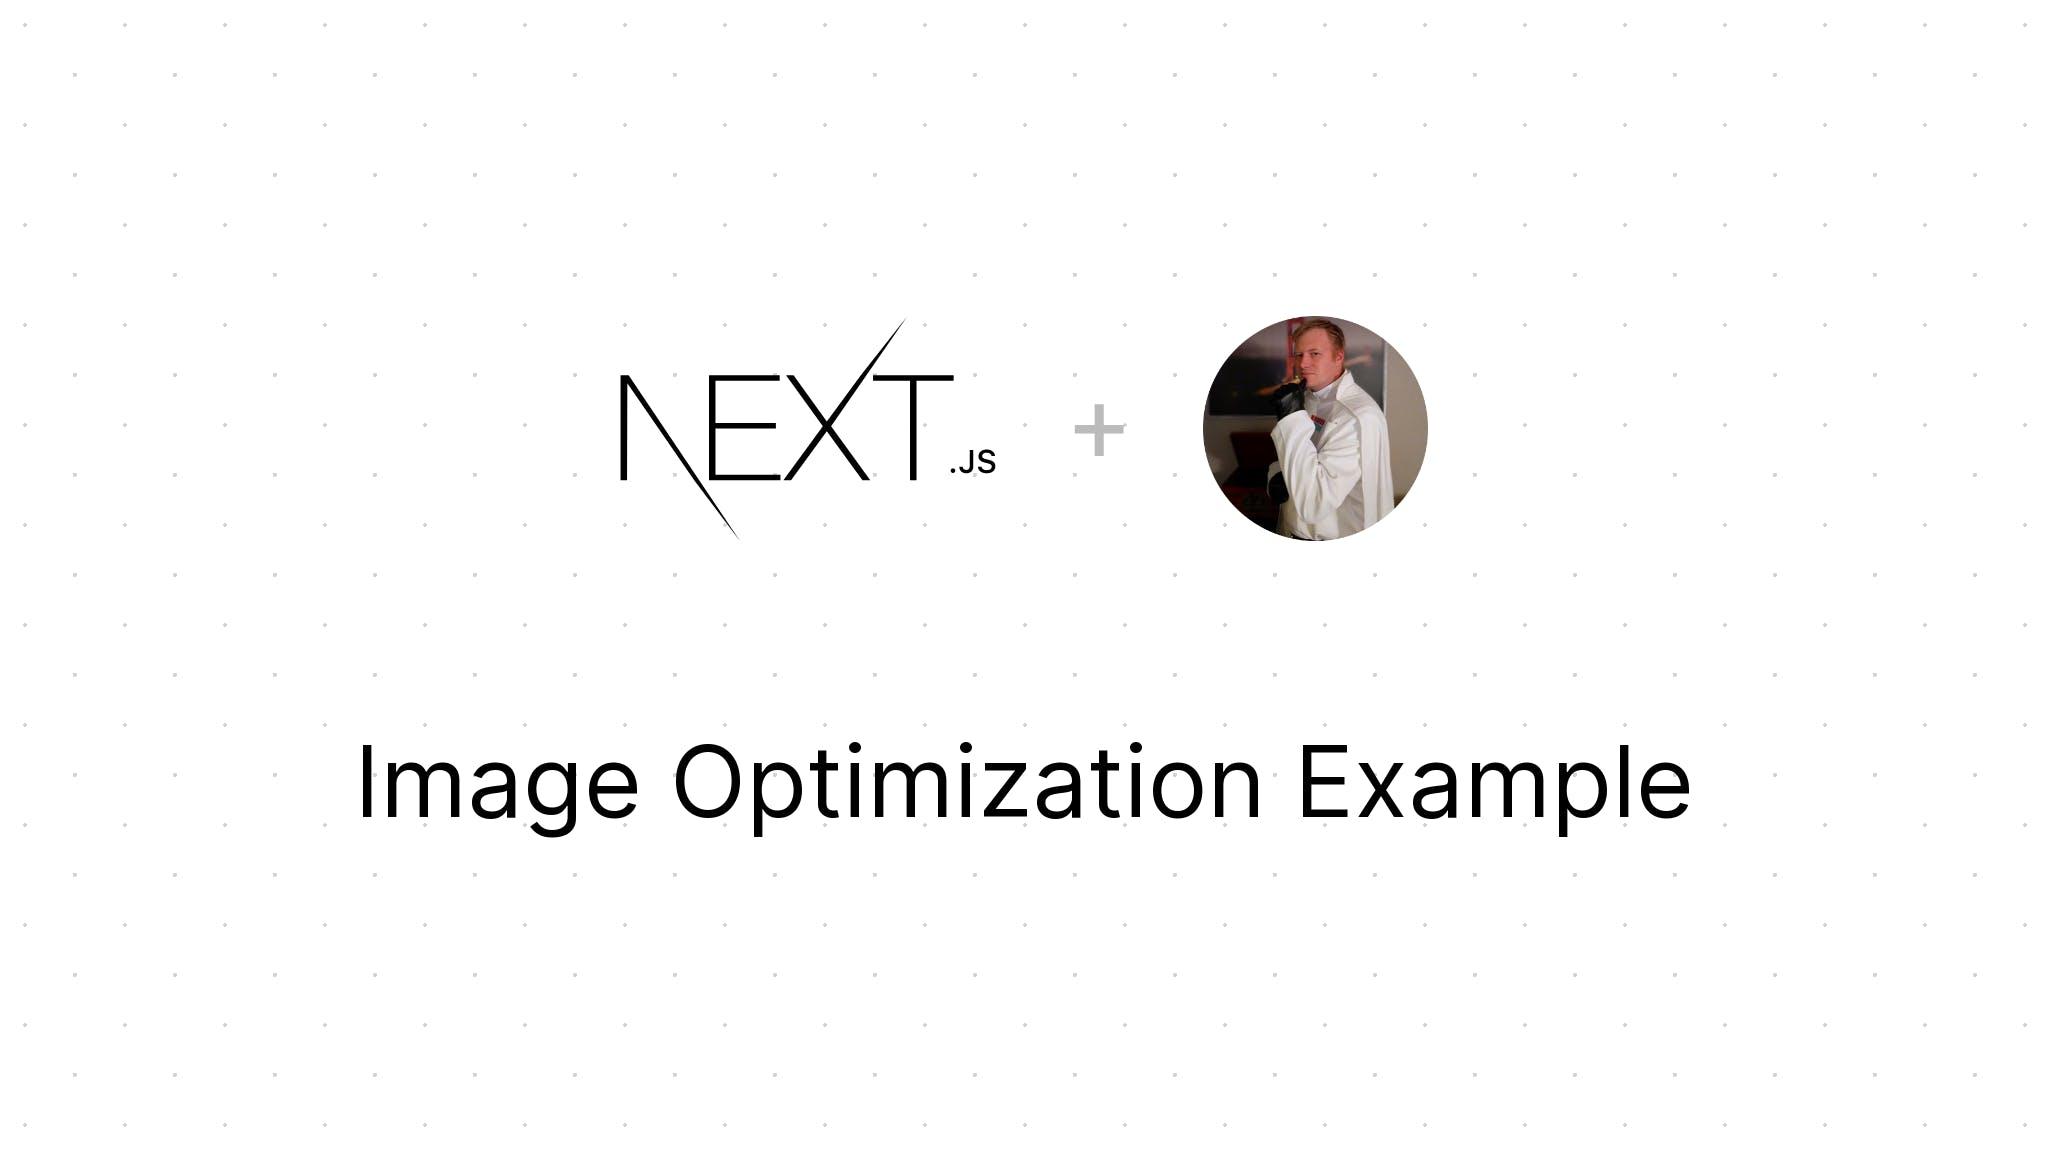 Image Optimization with Next JS